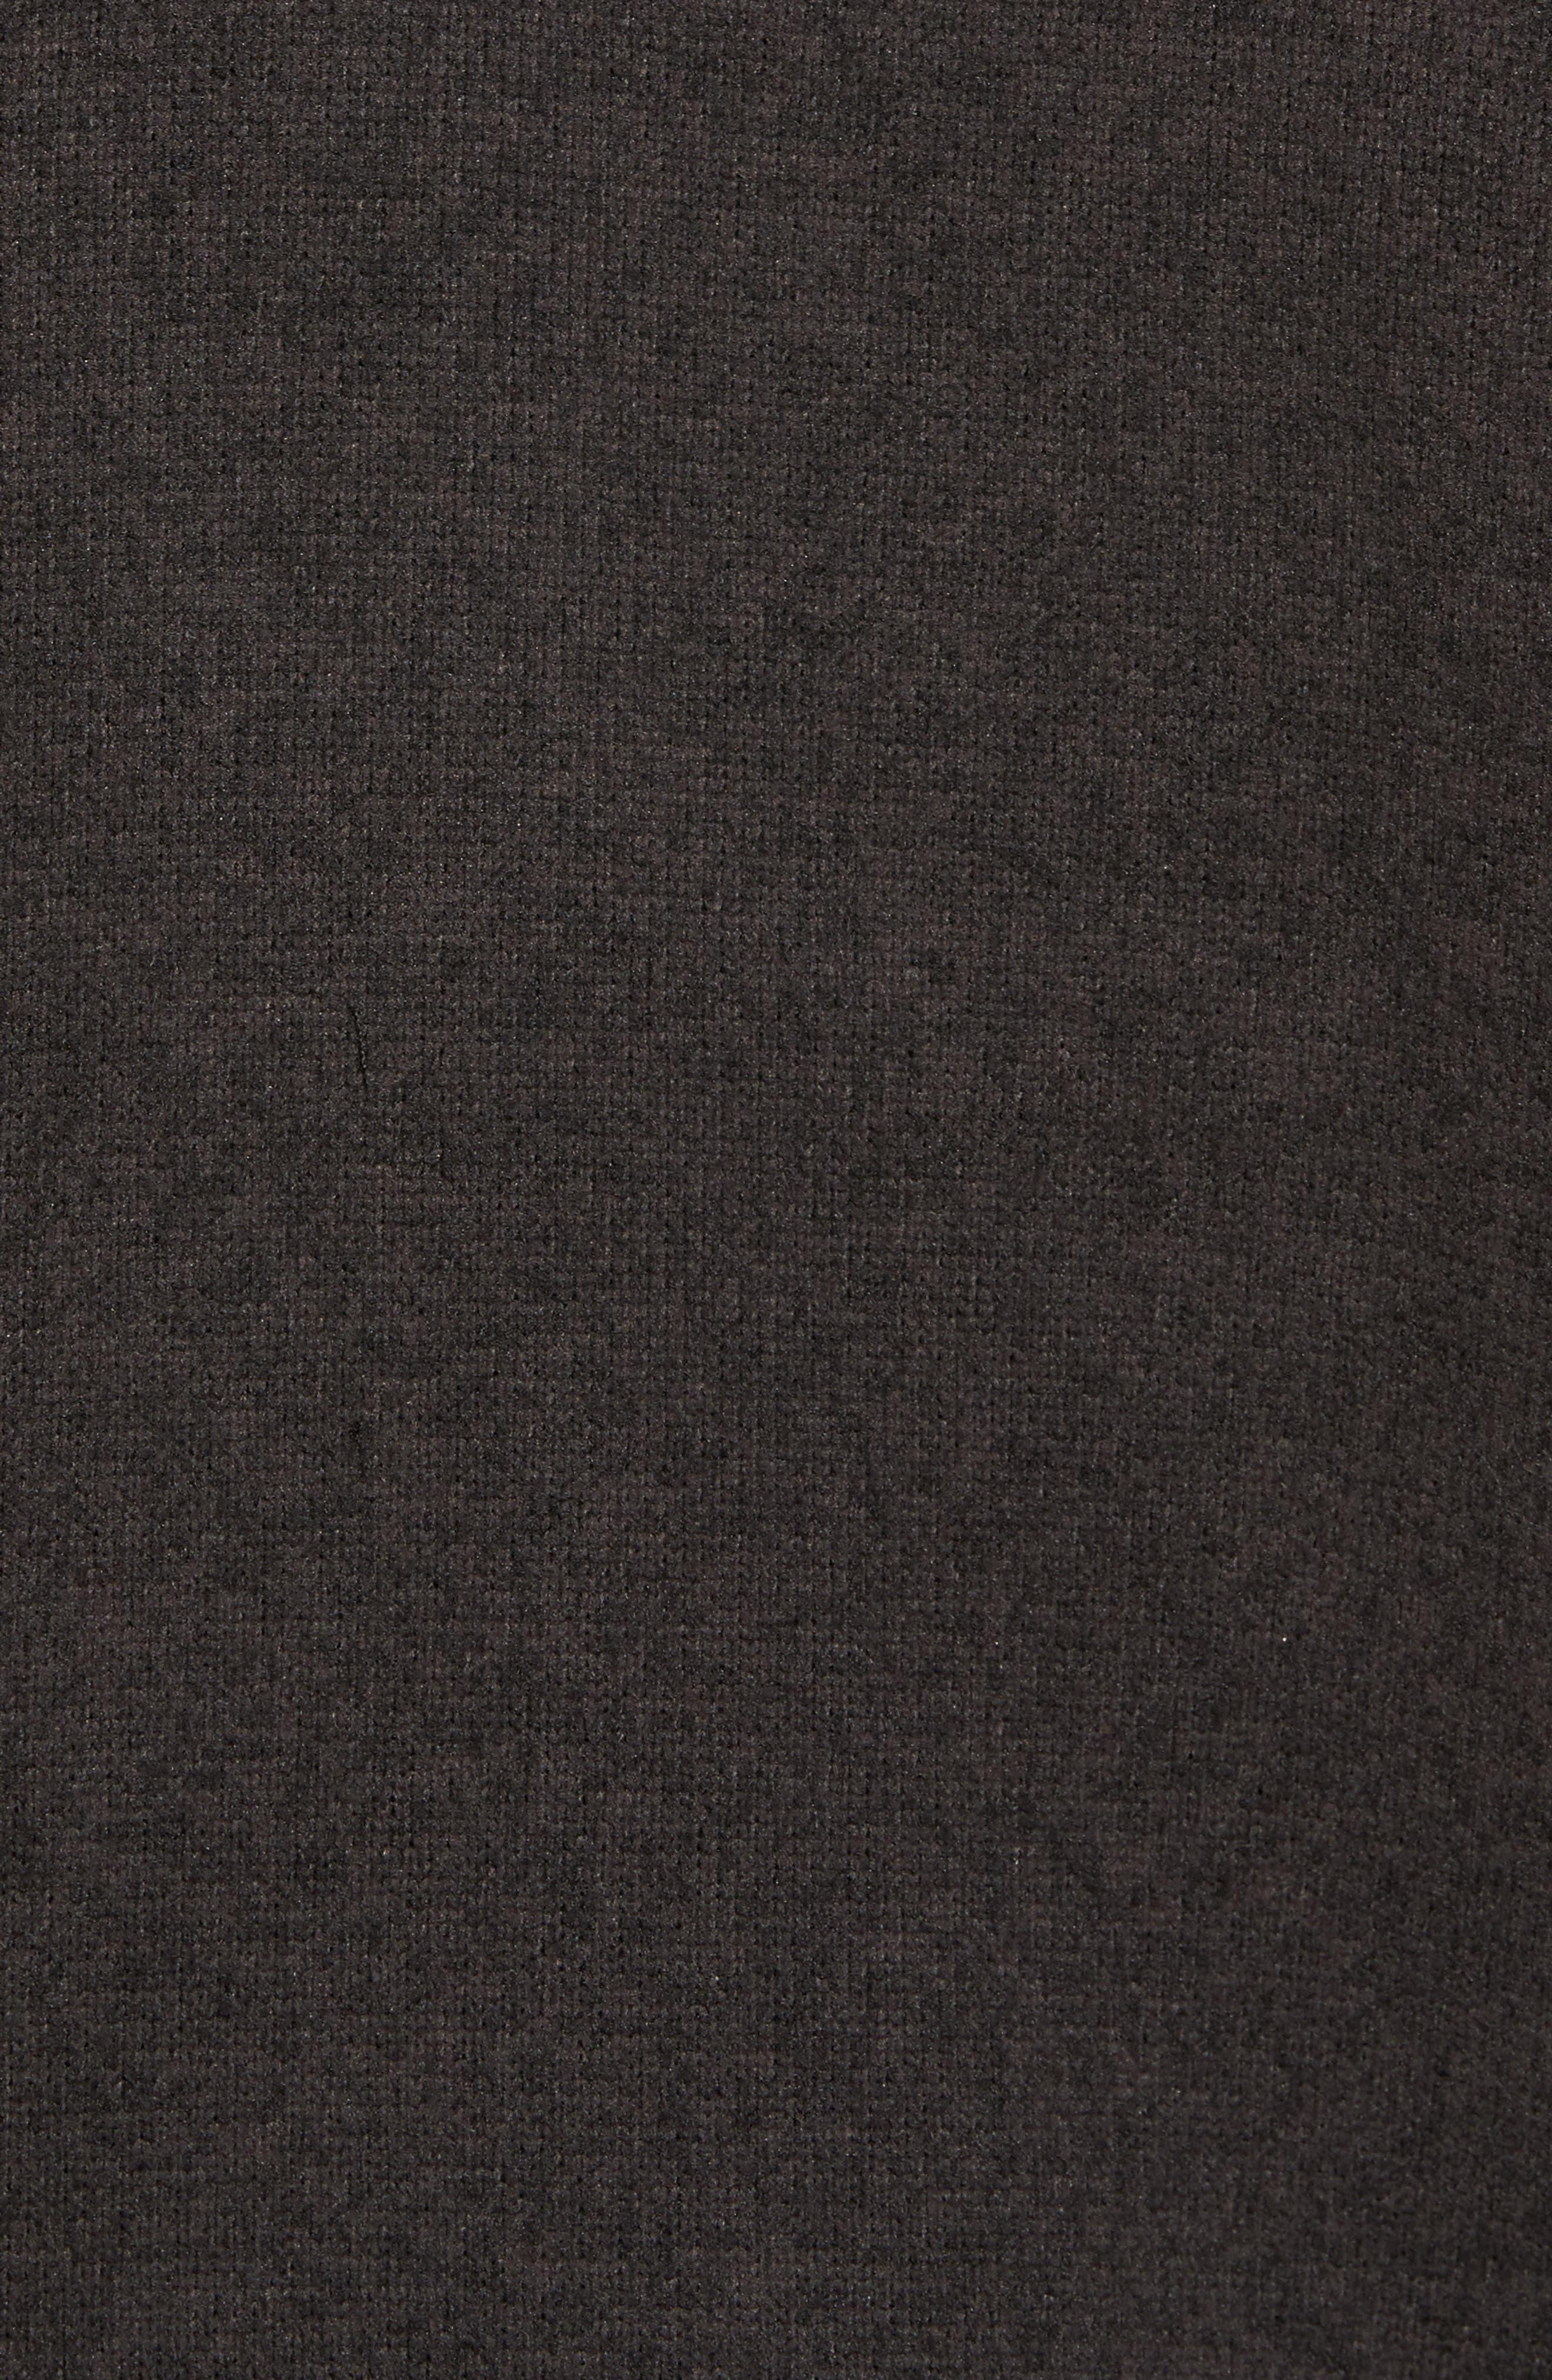 Gordon Lyons Zip Fleece Vest,                             Alternate thumbnail 26, color,